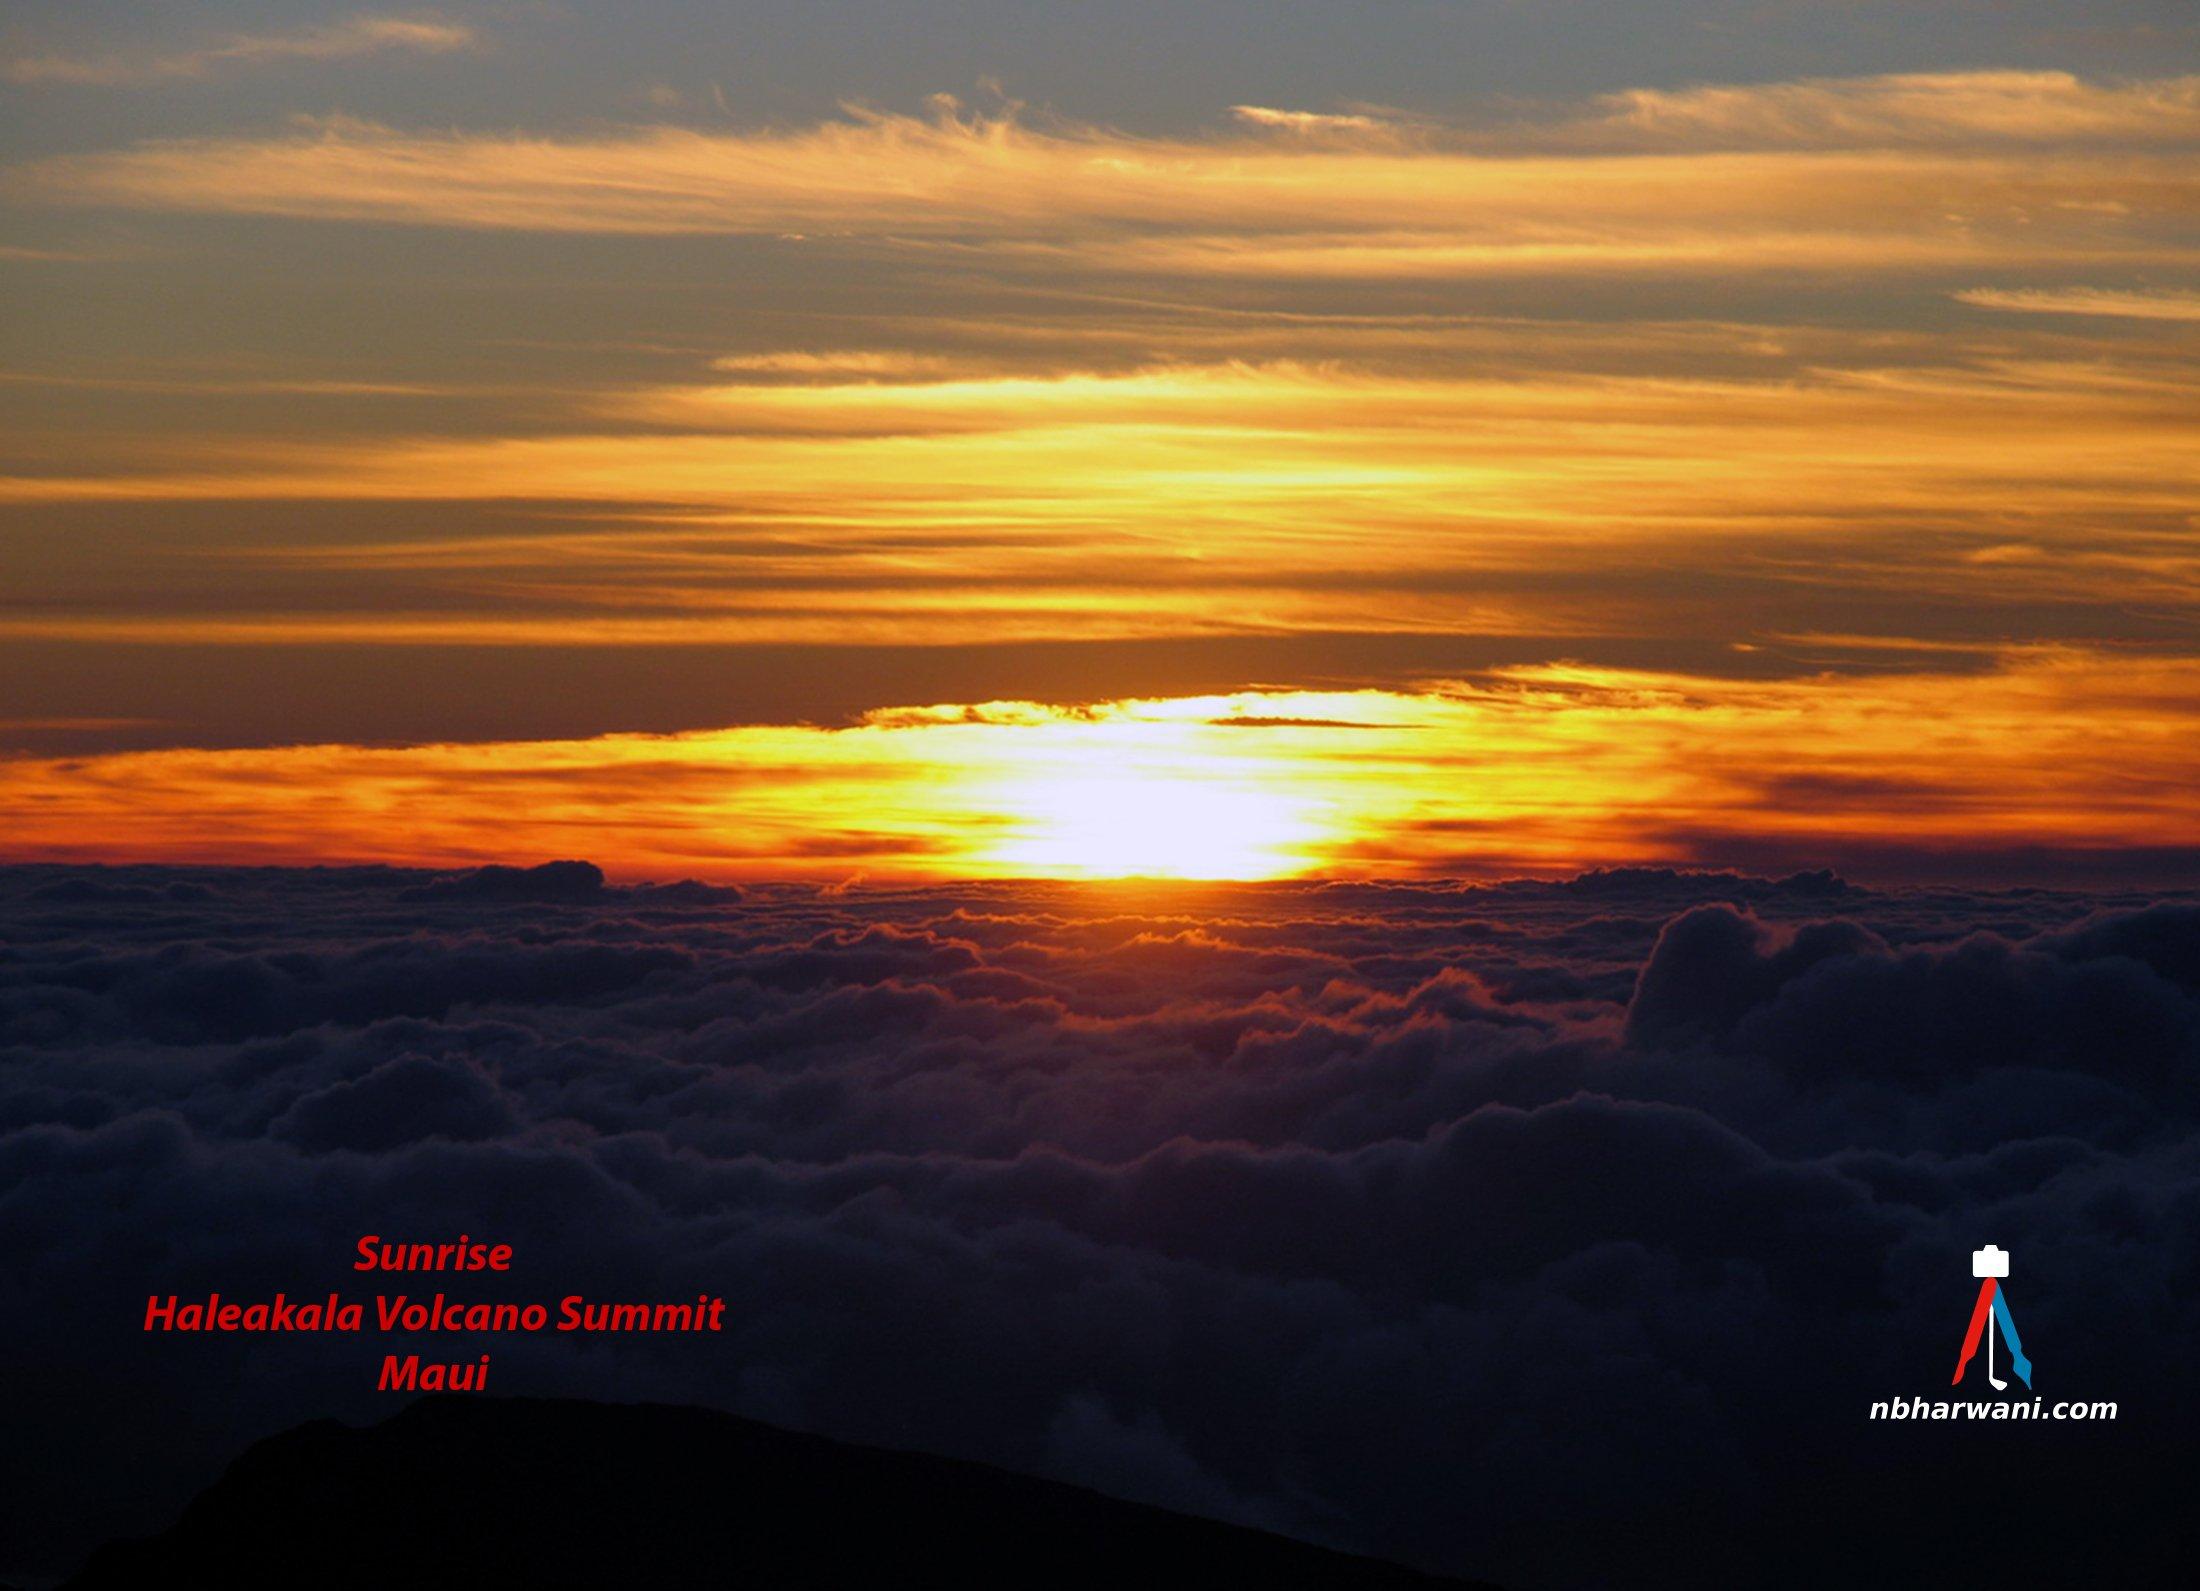 Sunrise at Haleakala Volcano Summit in Maui, Hawaii. (Dr. Noorali Bharwani)